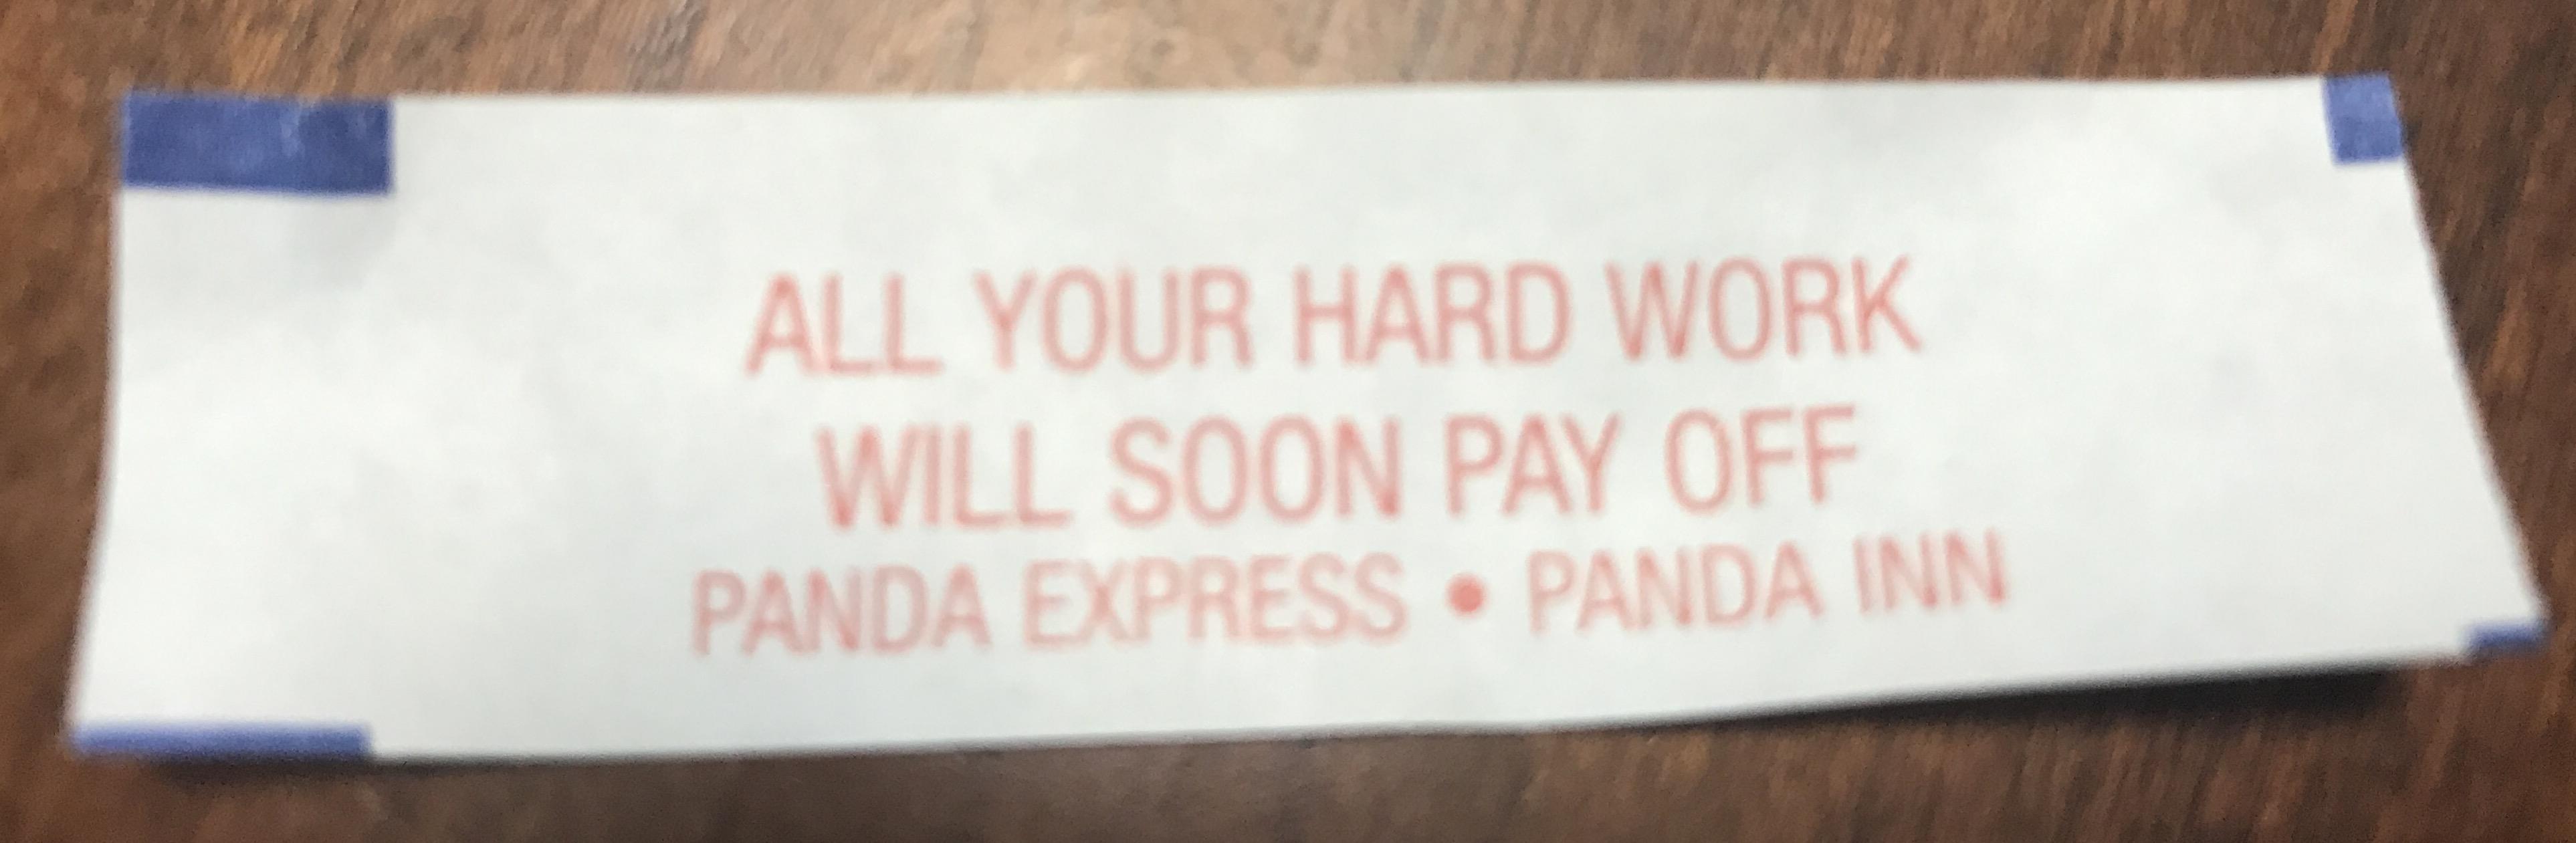 hard-work-will-soon-pay-off.jpg